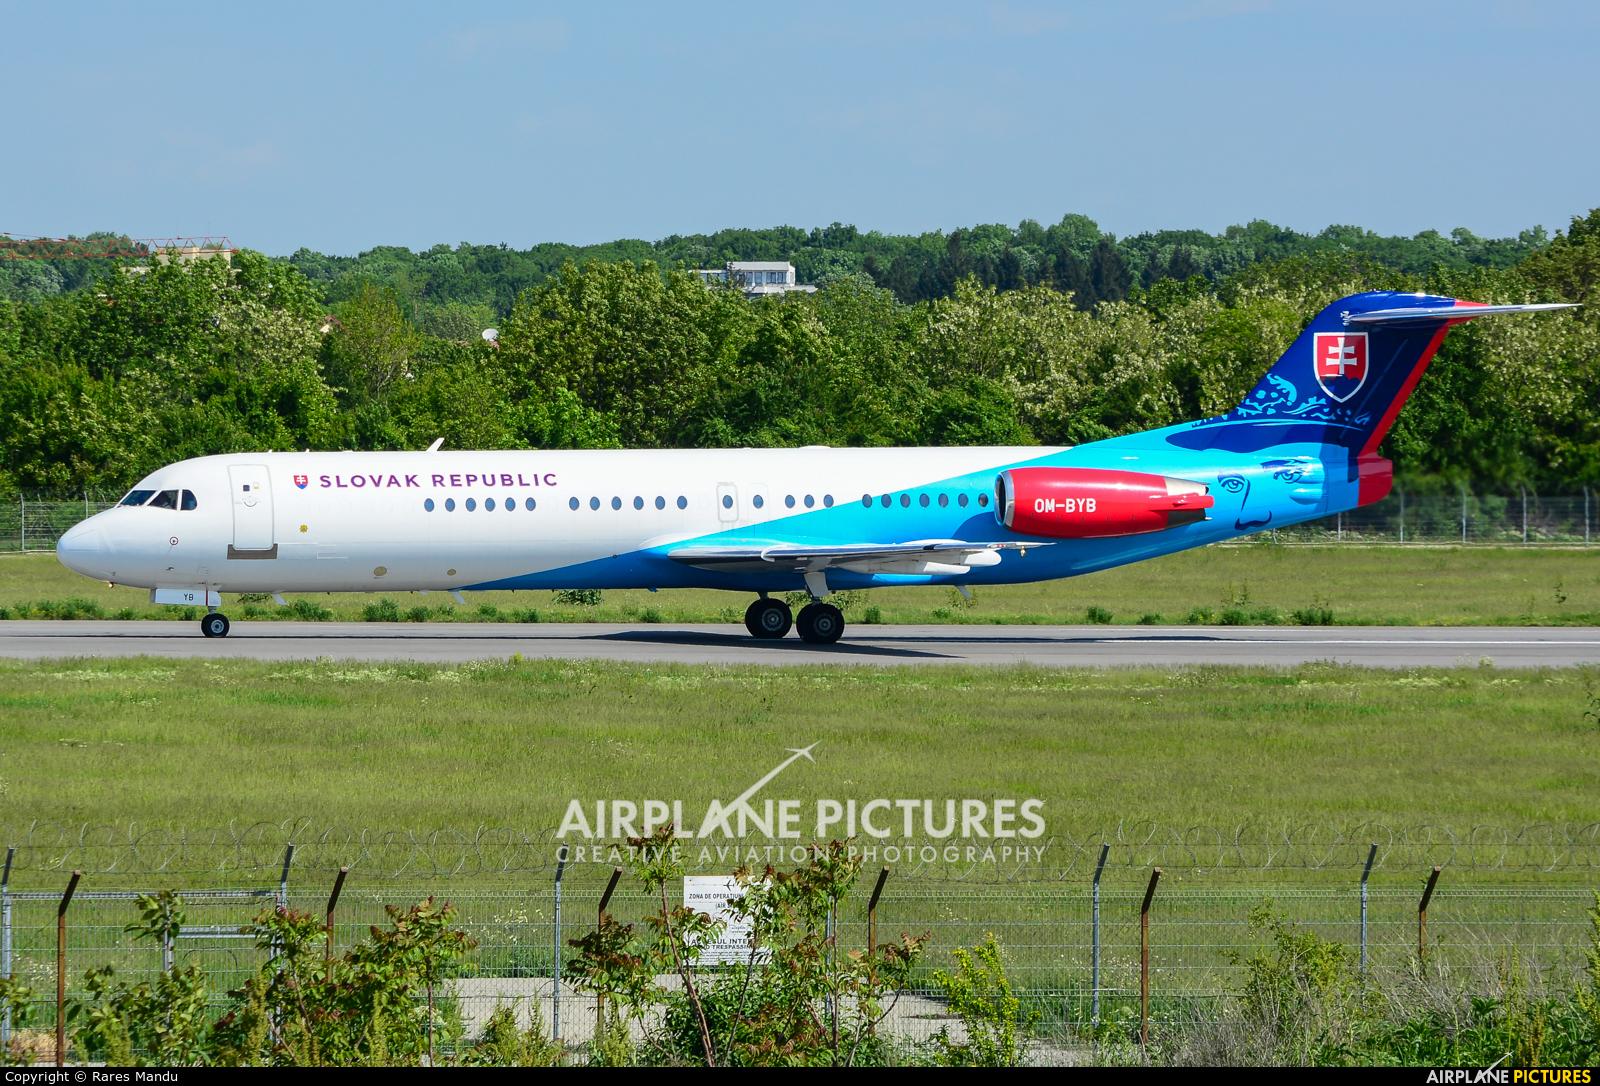 Slovakia - Government OM-BYB aircraft at Bucharest - Aurel Vlaicu Intl